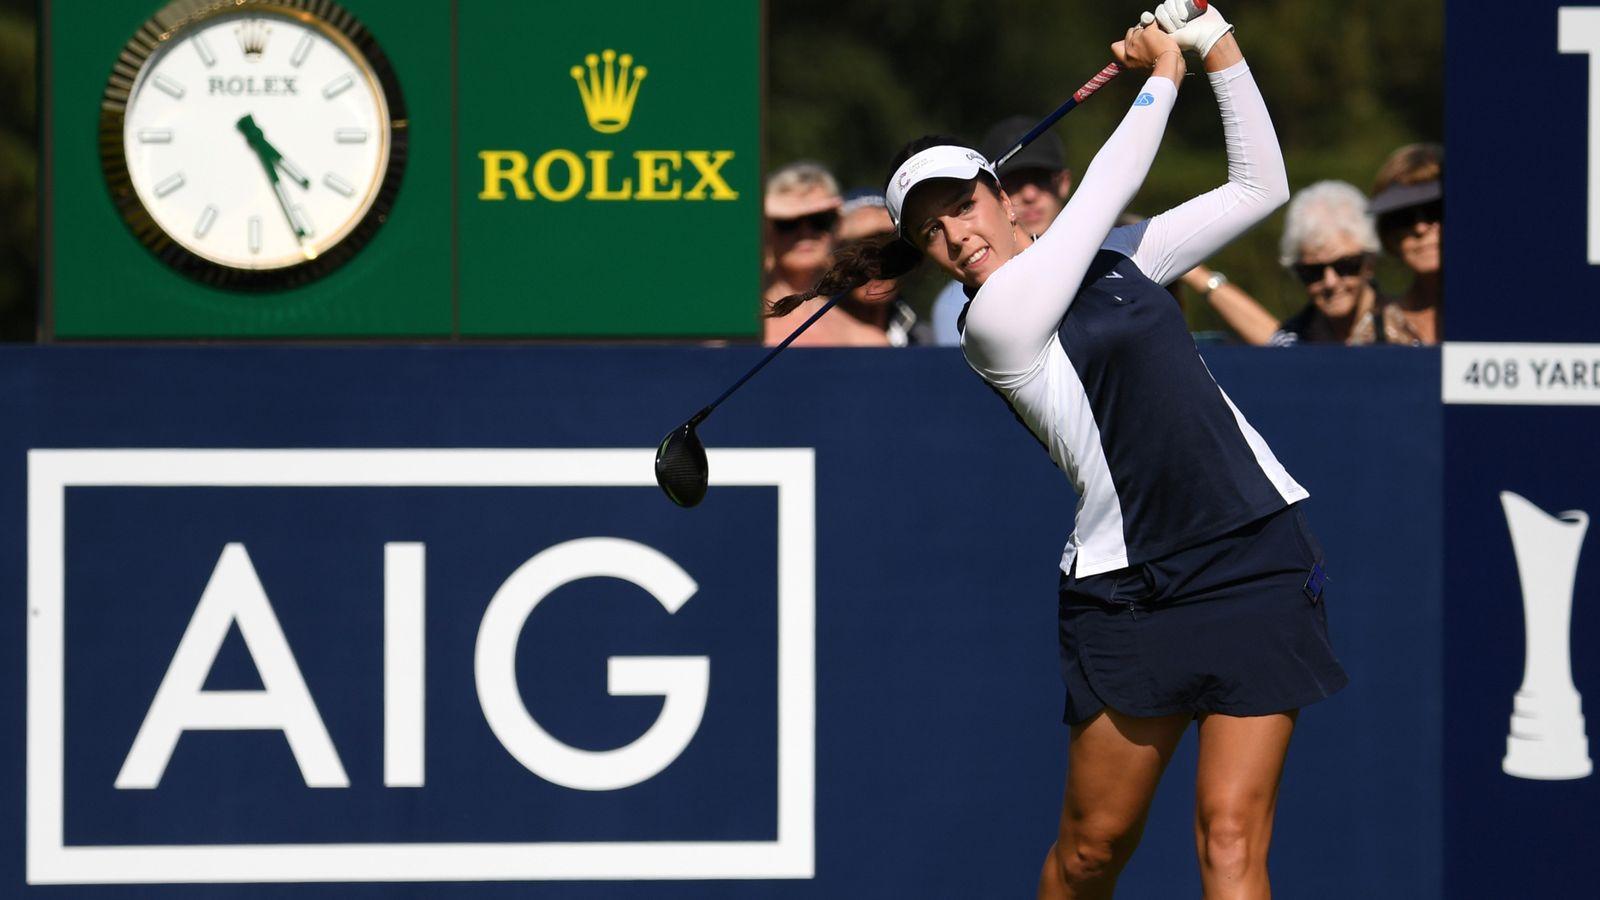 AIG Women's Open: Key TV times, ways to watch live on Sky Sports